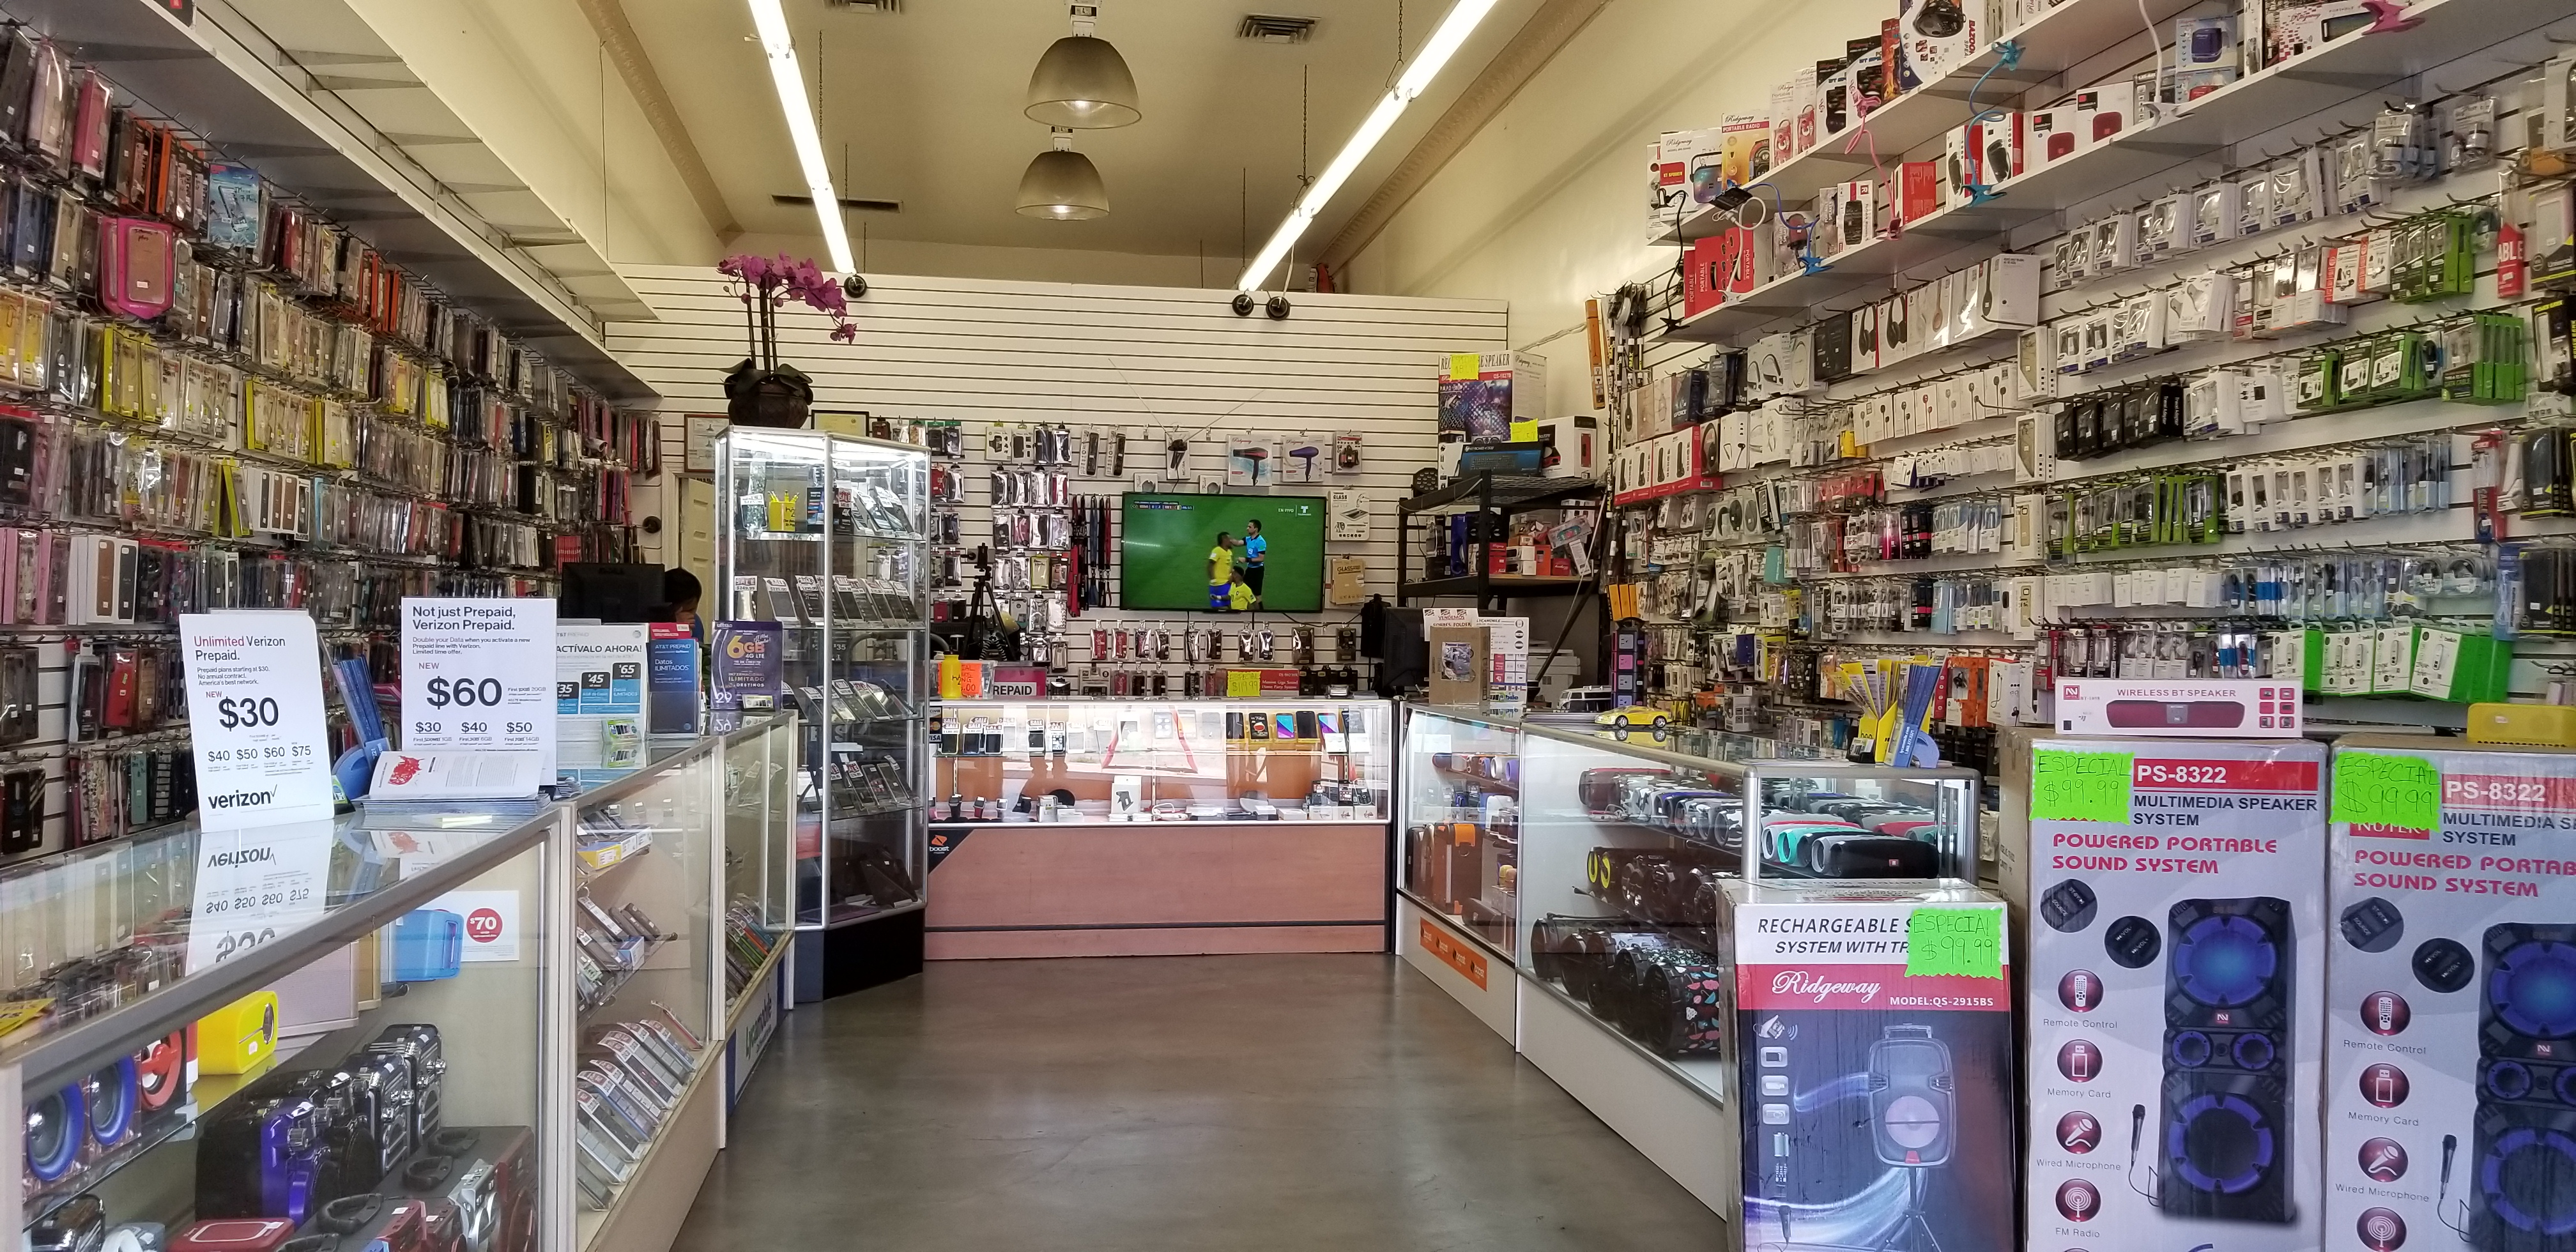 Wireless Source Los Angeles Wireless Retailer image 1